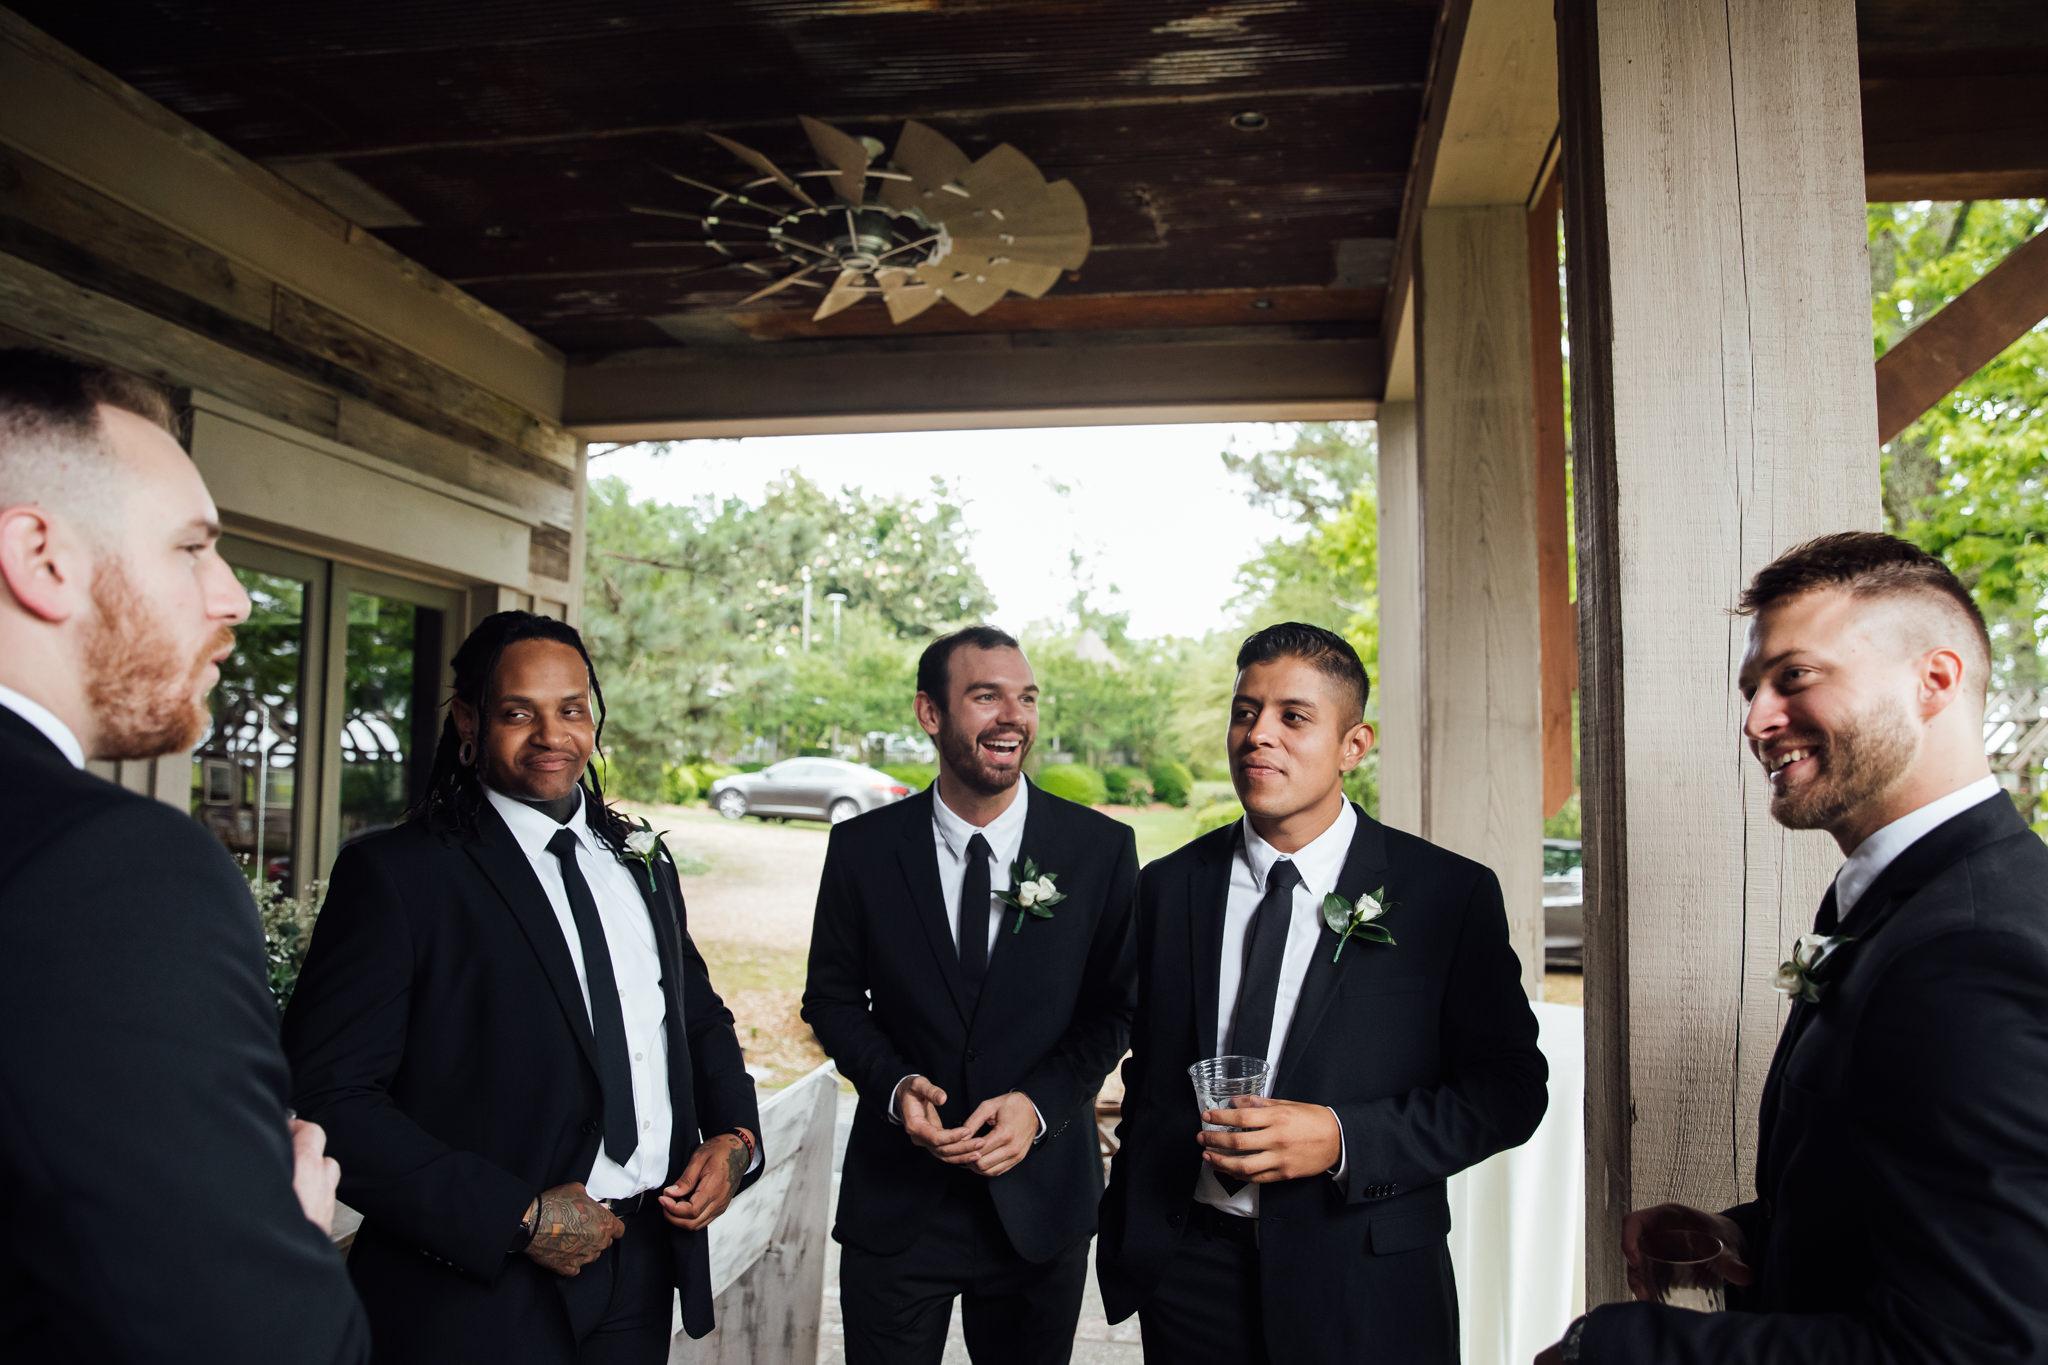 phantom-canyon-brewery-colorado-springs-wedding-photographer-270.jpg